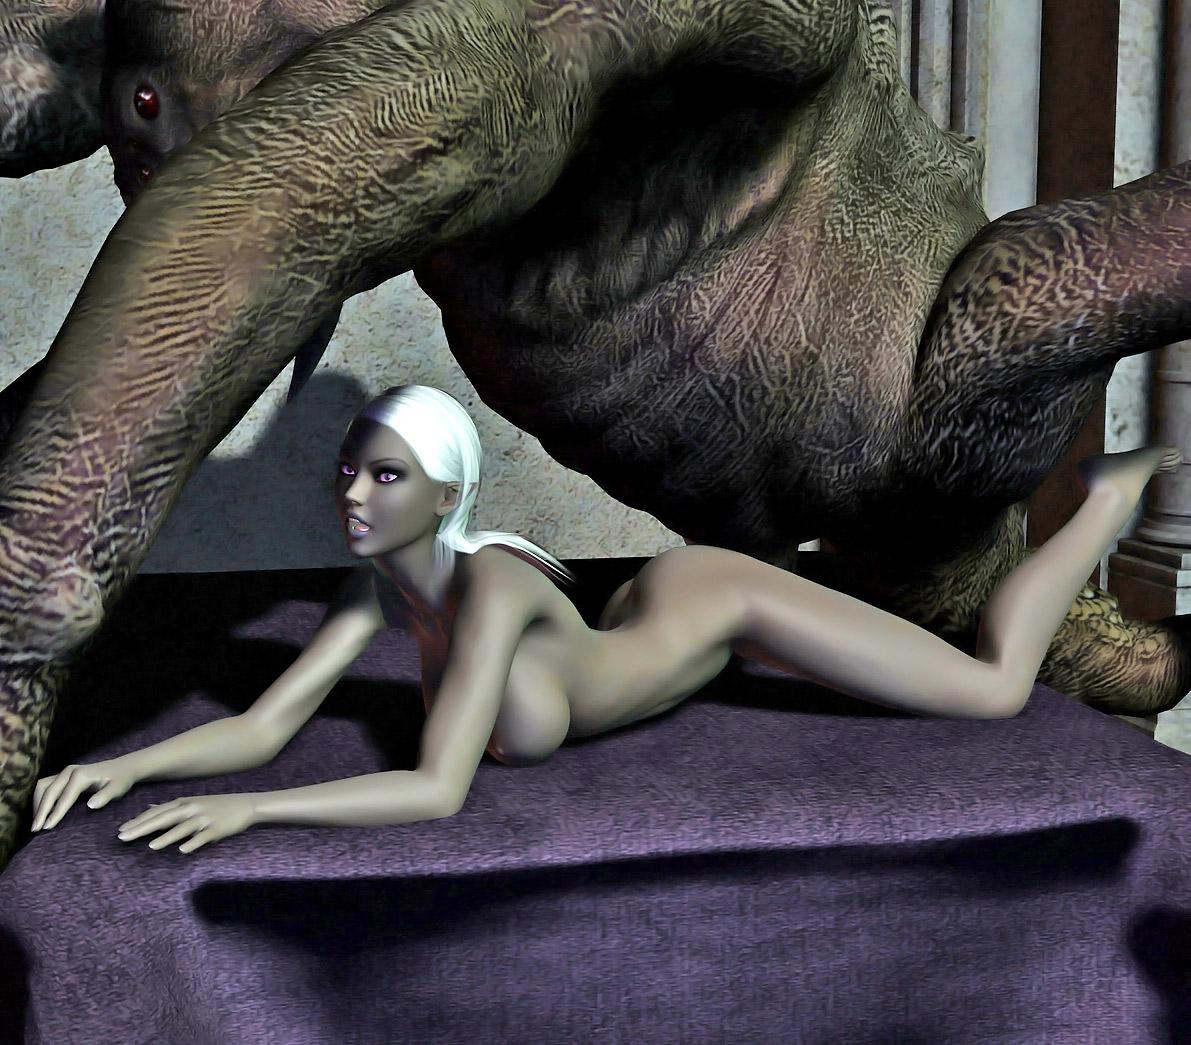 Anime elf girls suck cock images nude scene